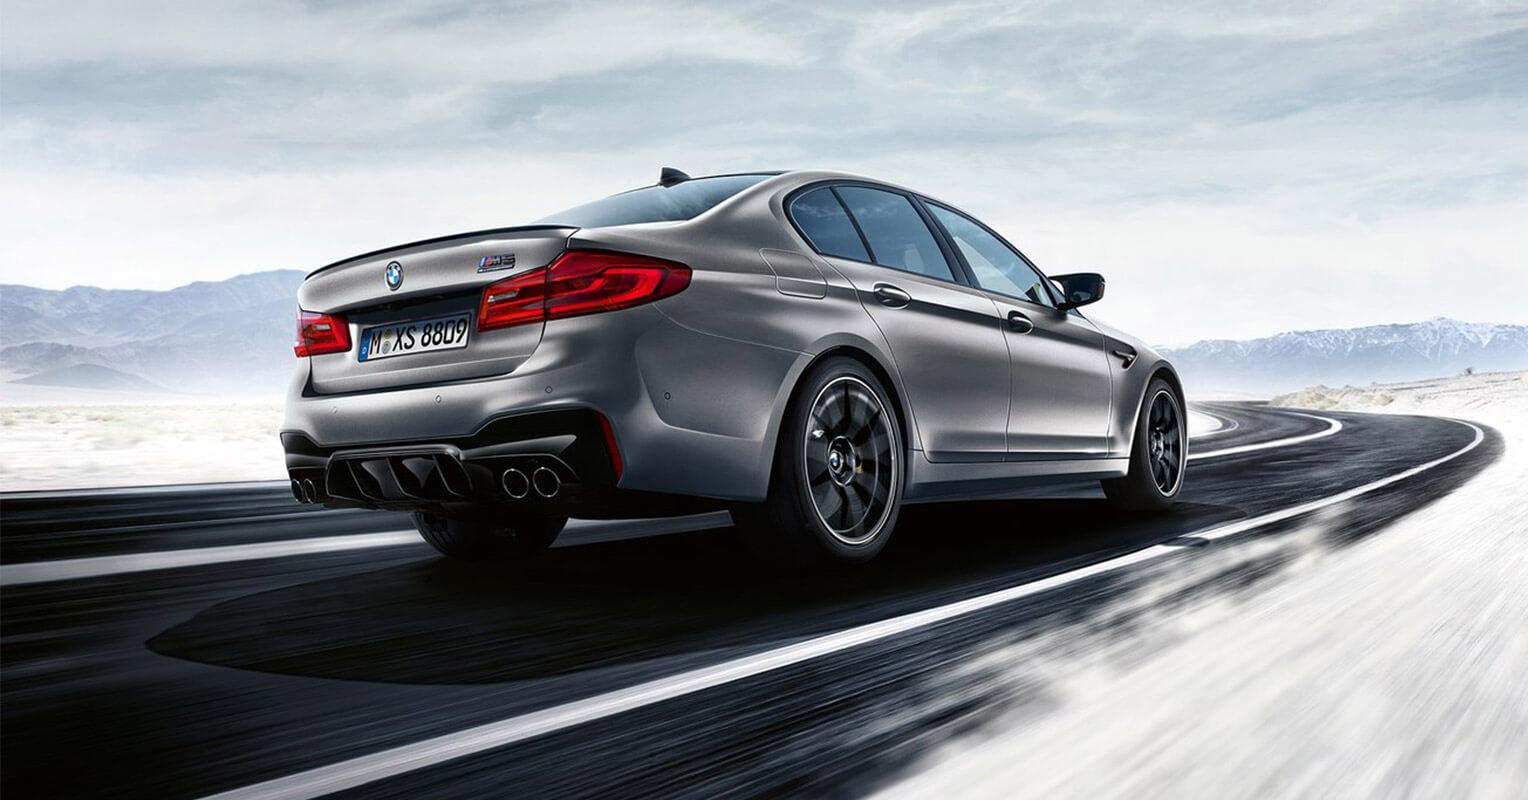 Trasera del BMW M5 Competition 2018